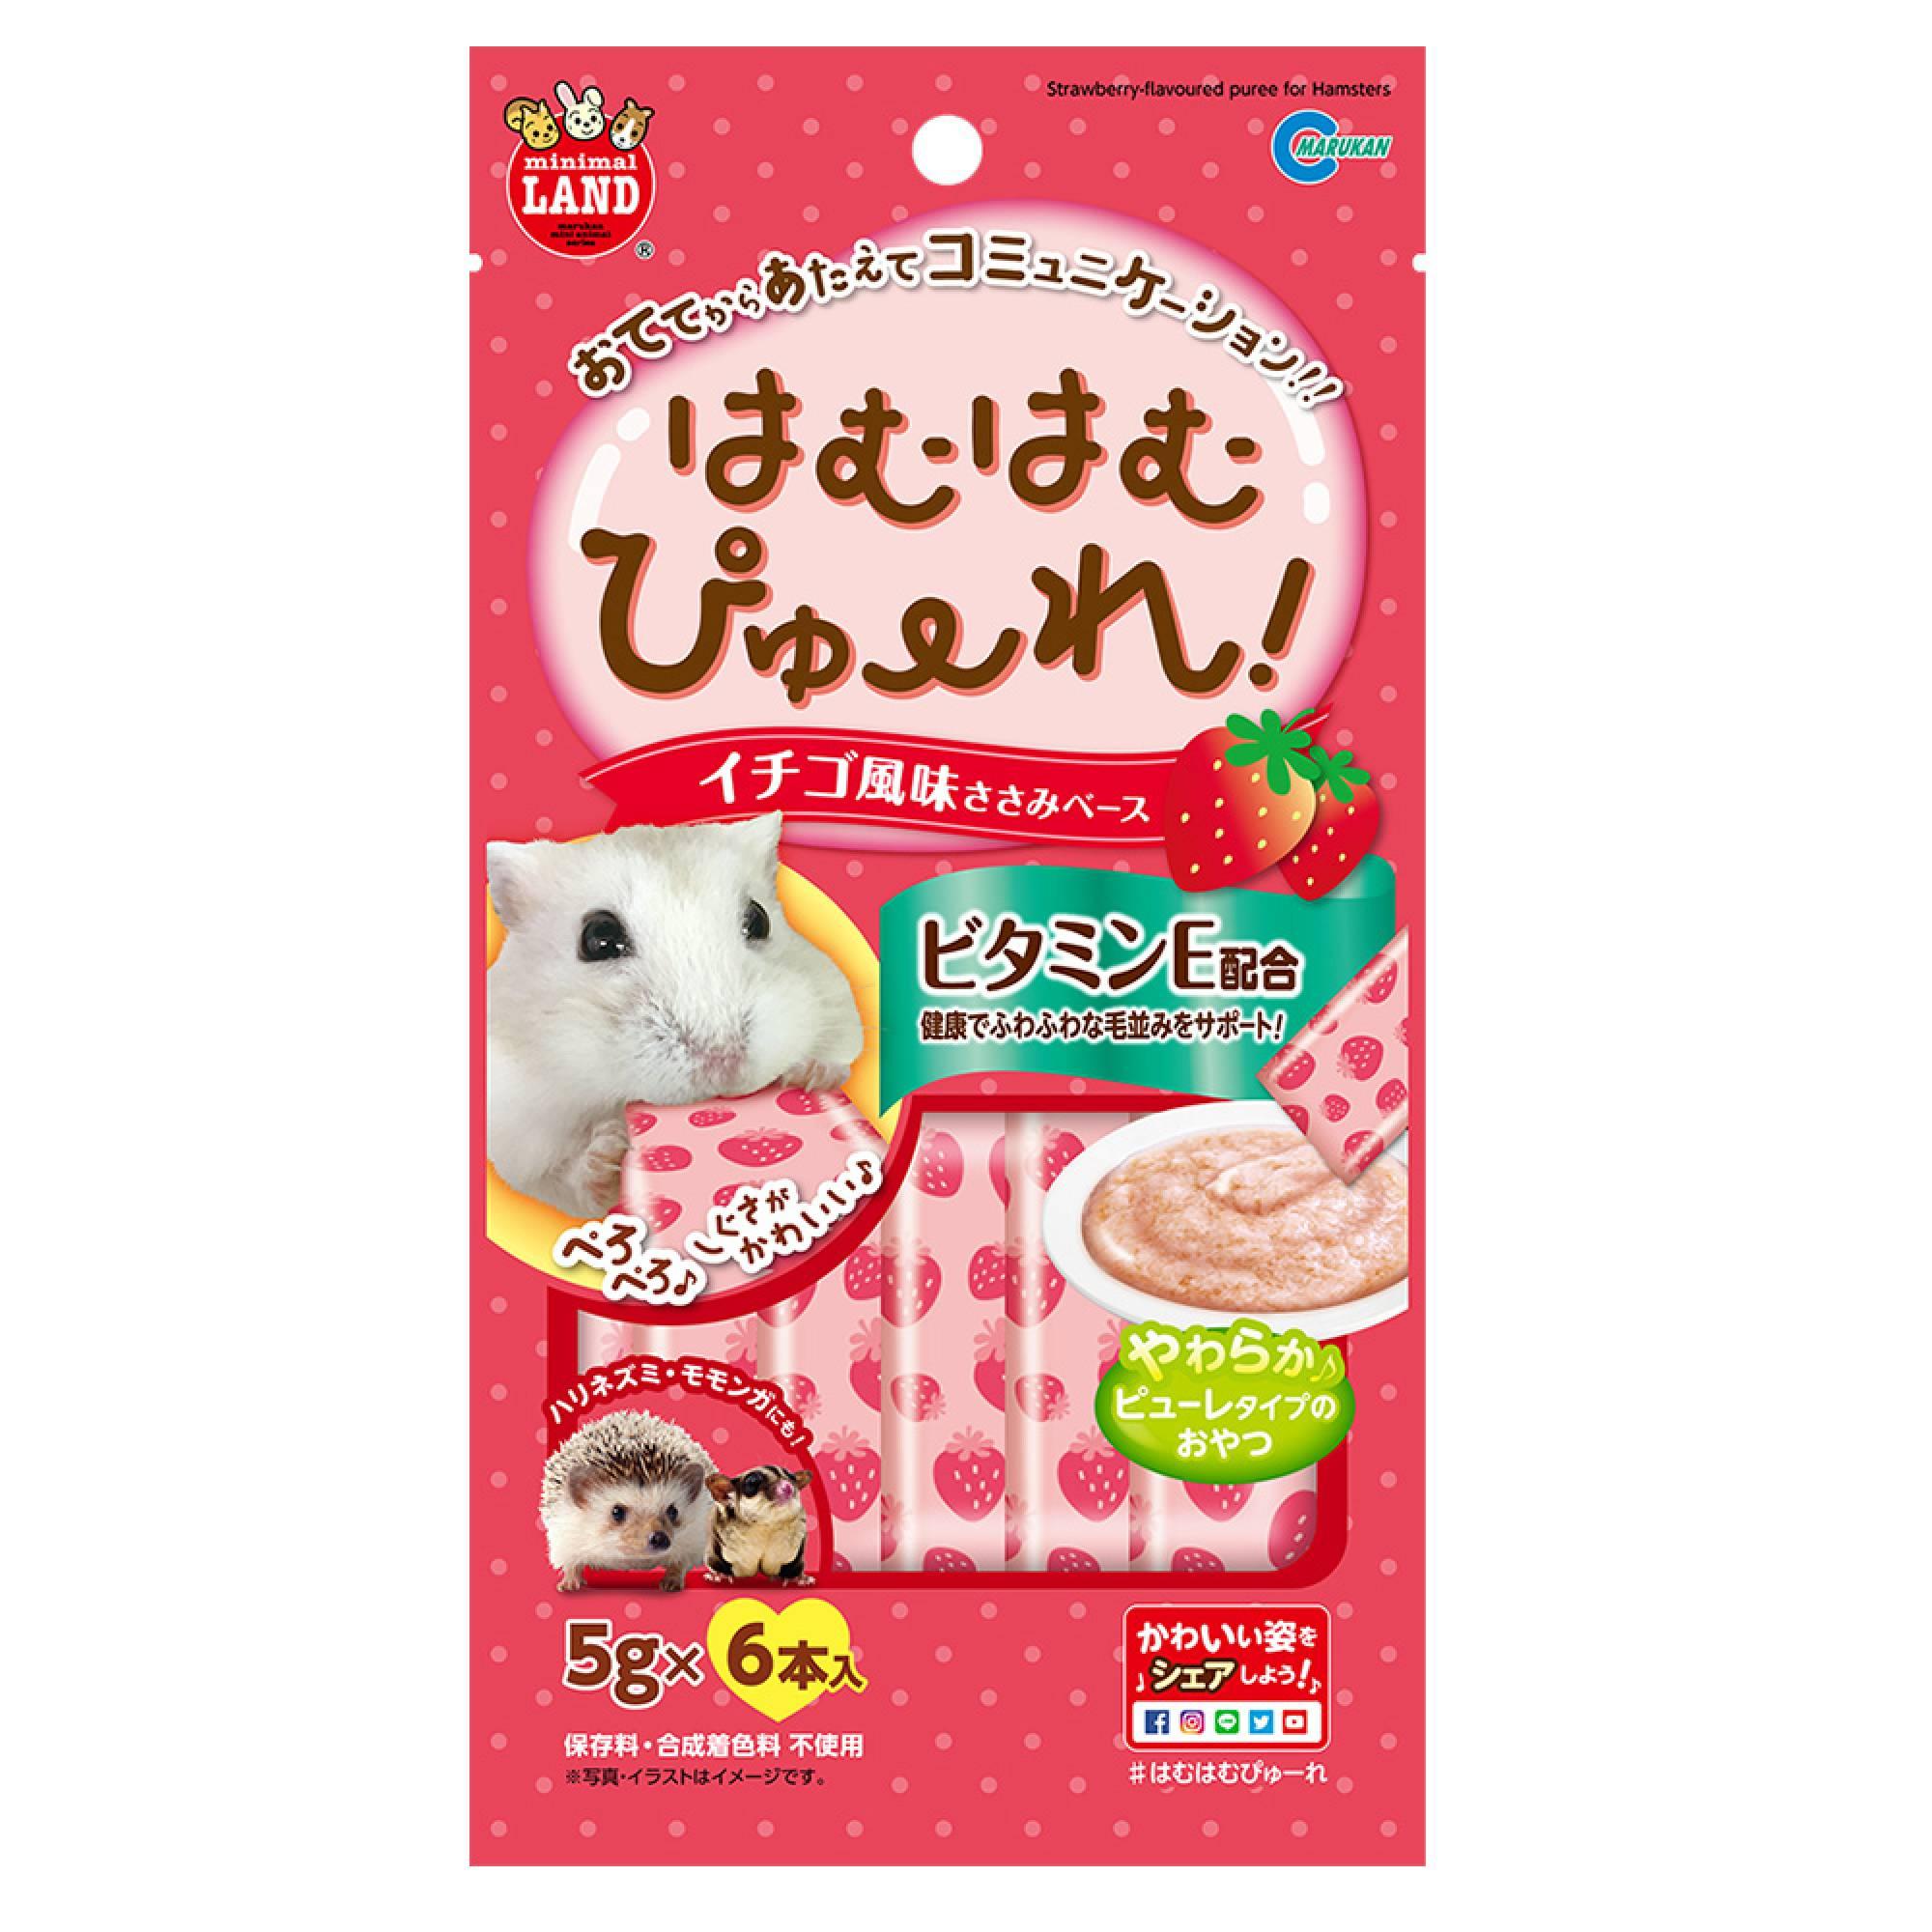 Marukan MR845 - Hamster Puree Strawberry Flavor 5gx6